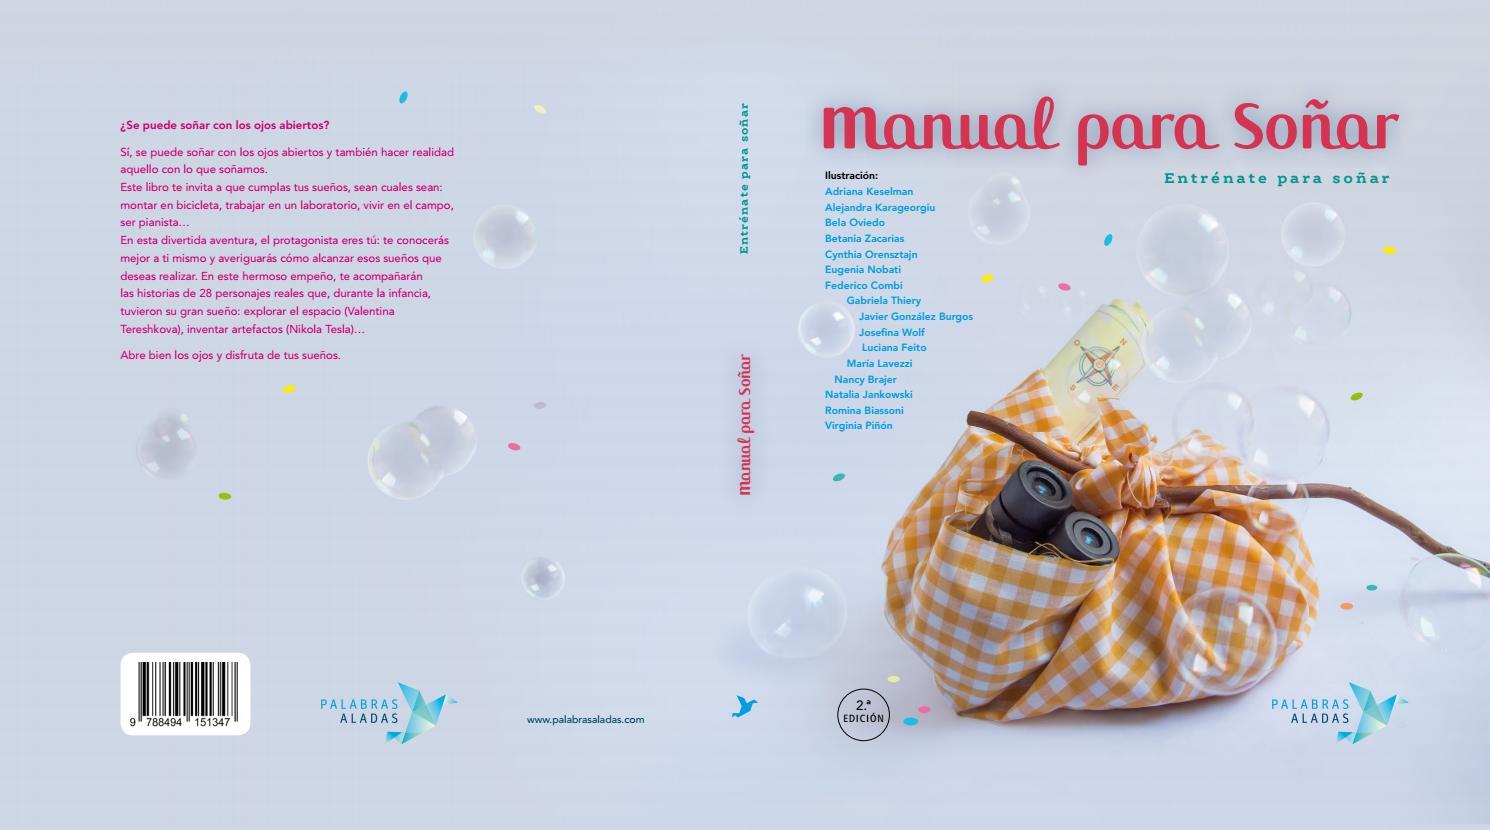 Manual para sonar muestra by Ed Ara - issuu